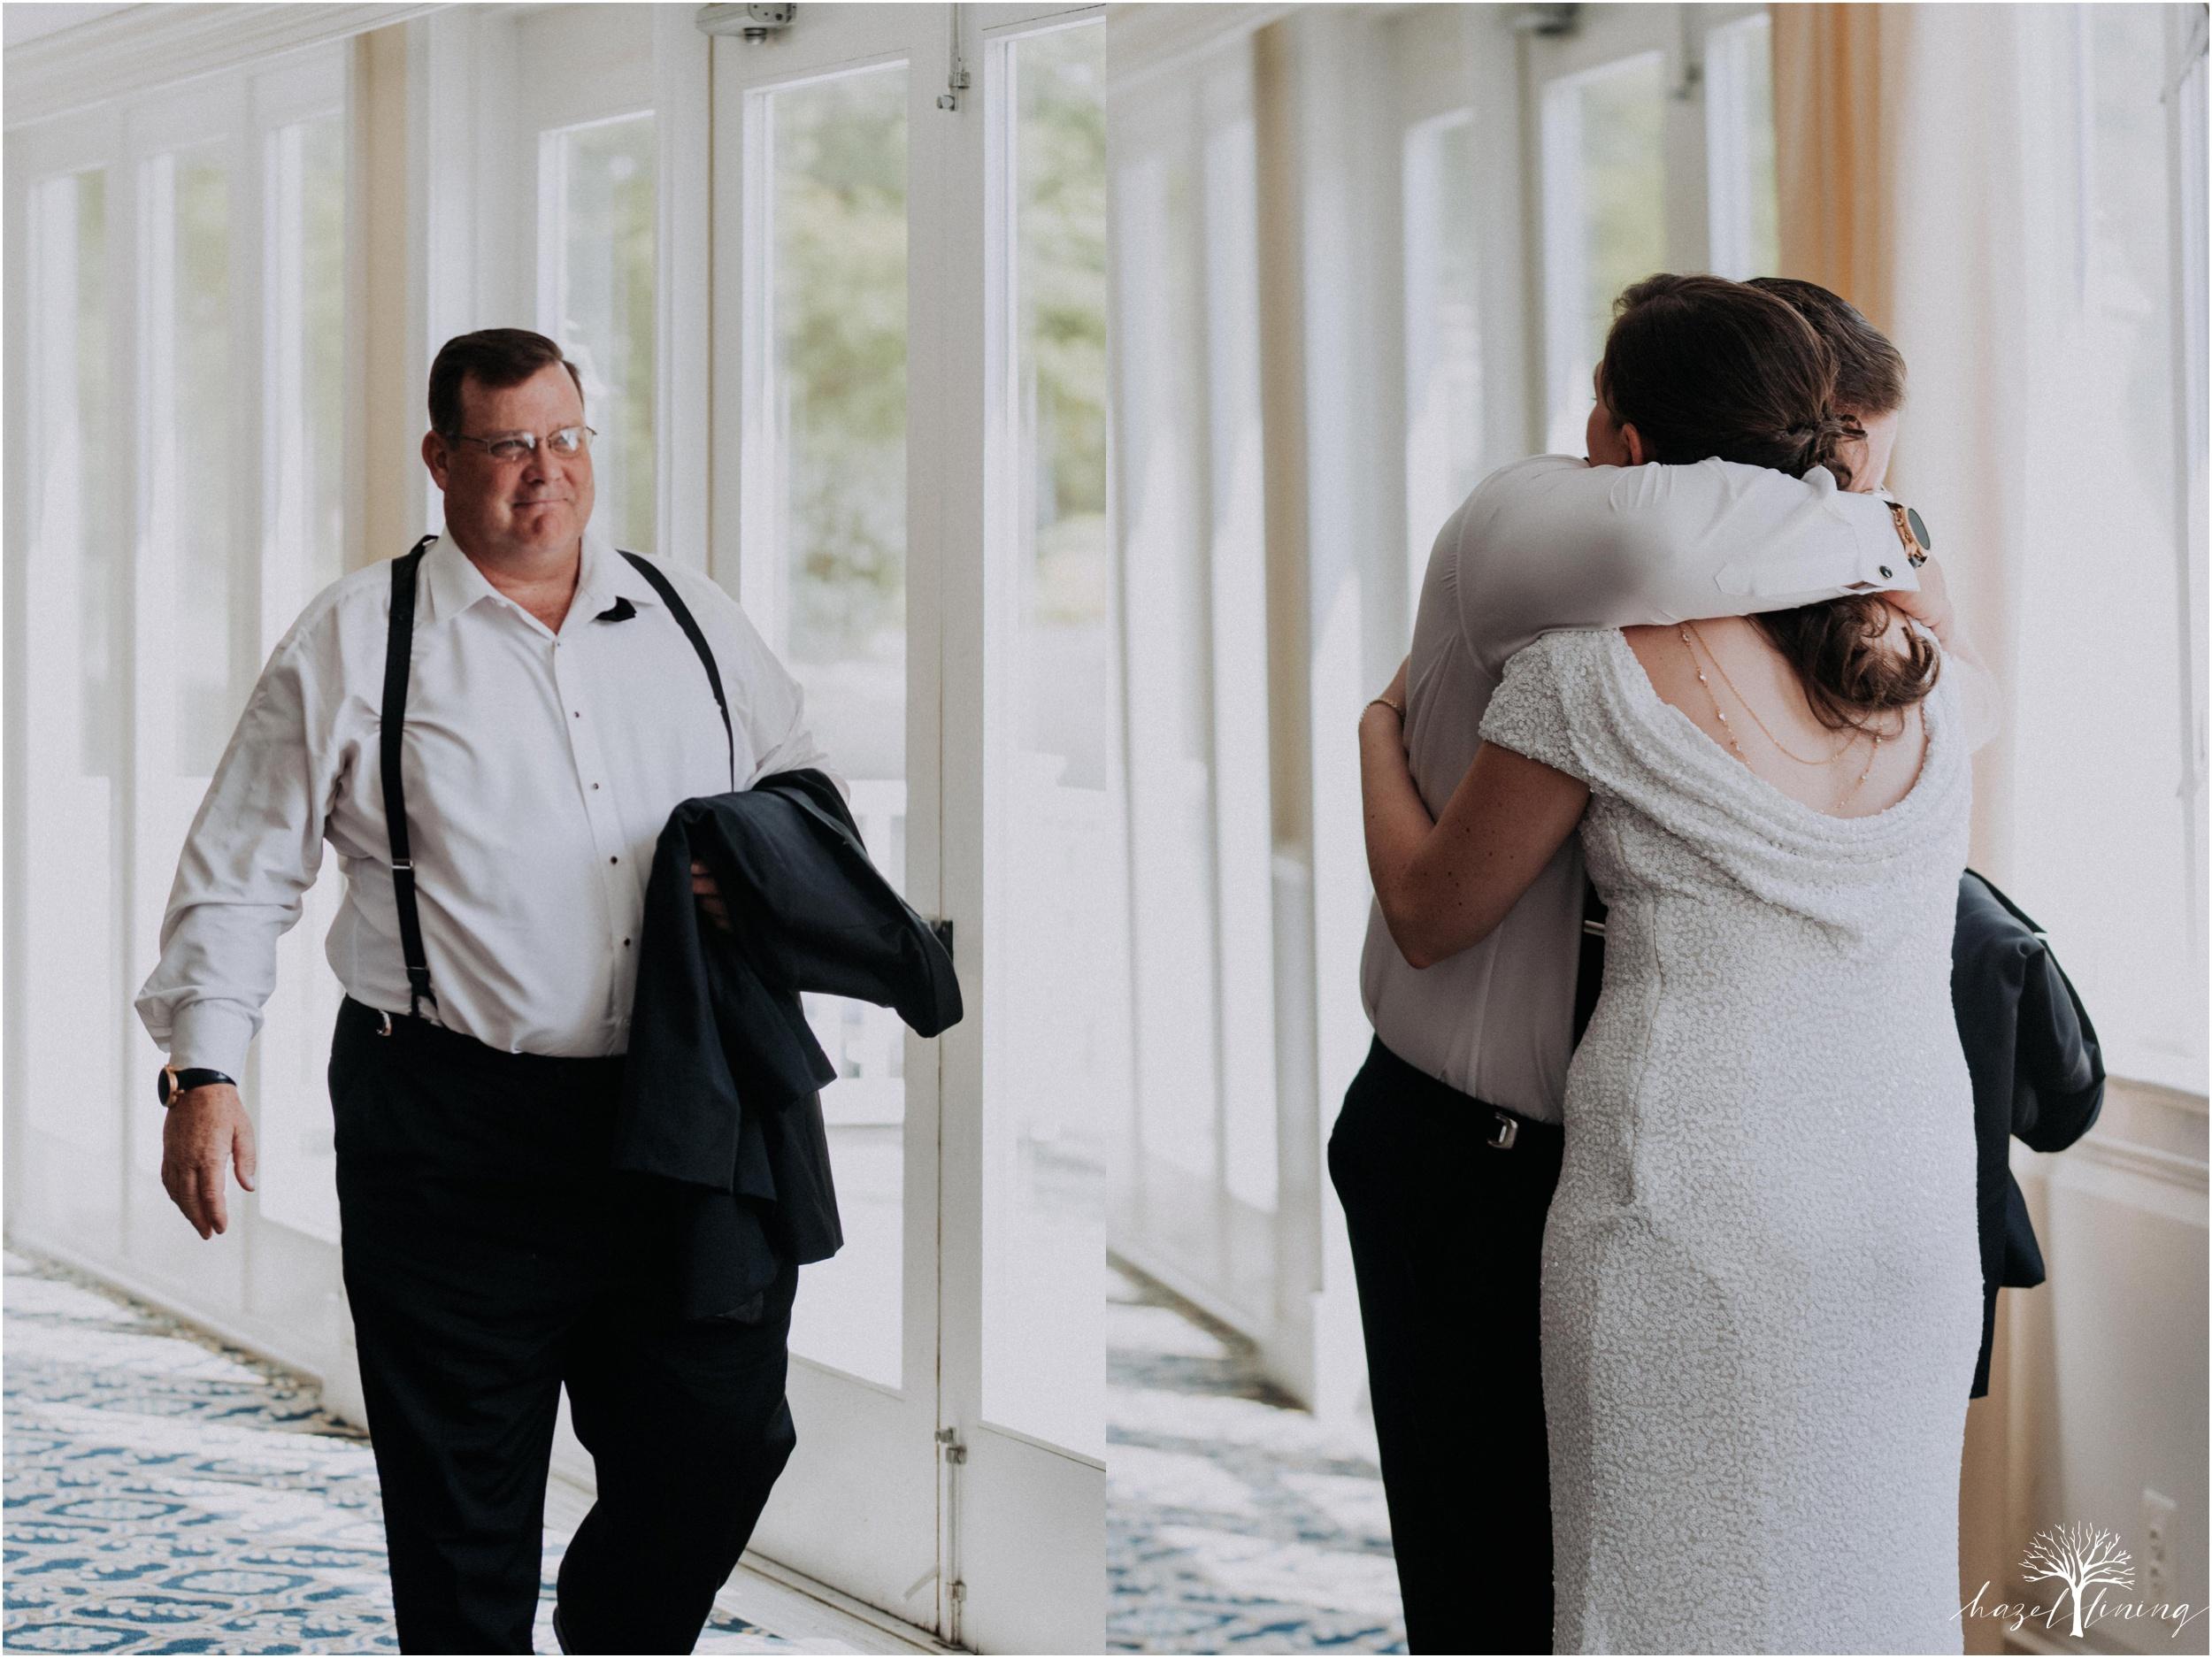 elizabeth-doelp-andrew-foreback-middletown-country-club-summer-langhorne-pennsylvania-wedding-hazel-lining-travel-wedding-elopement-photography_0024.jpg